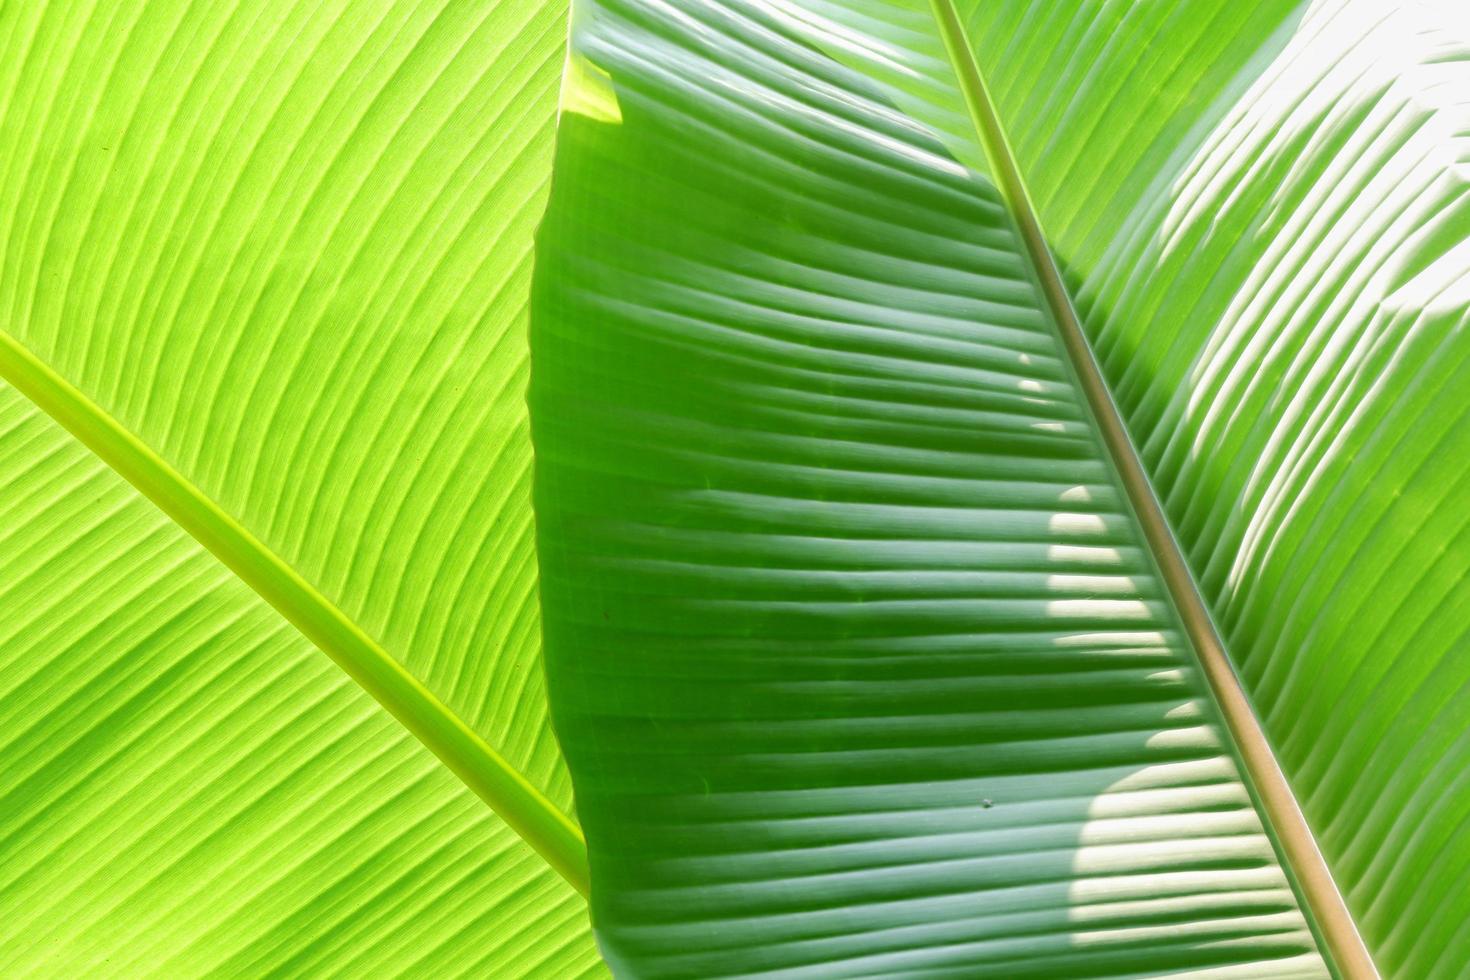 Banana leaf texture photo